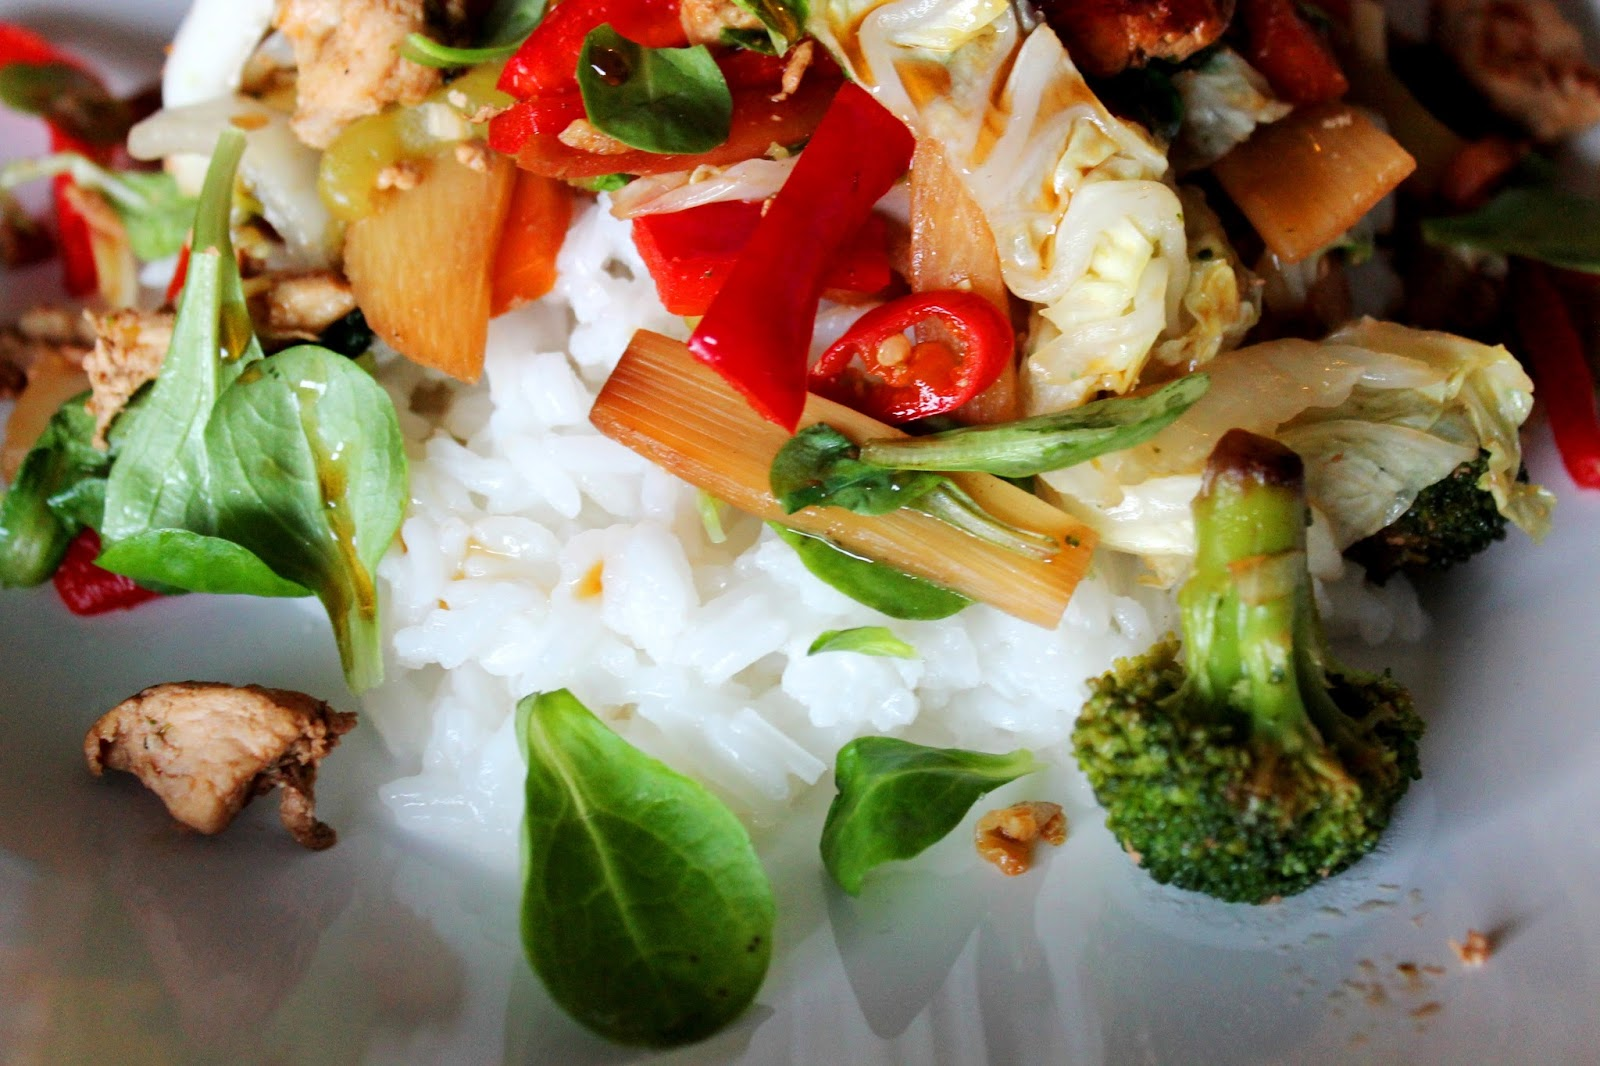 #vegetables #chicken #wok #asian #rice #chili #bamboo #broccoli #recipe #food #resepti #parsakaali #ruoka #dinner